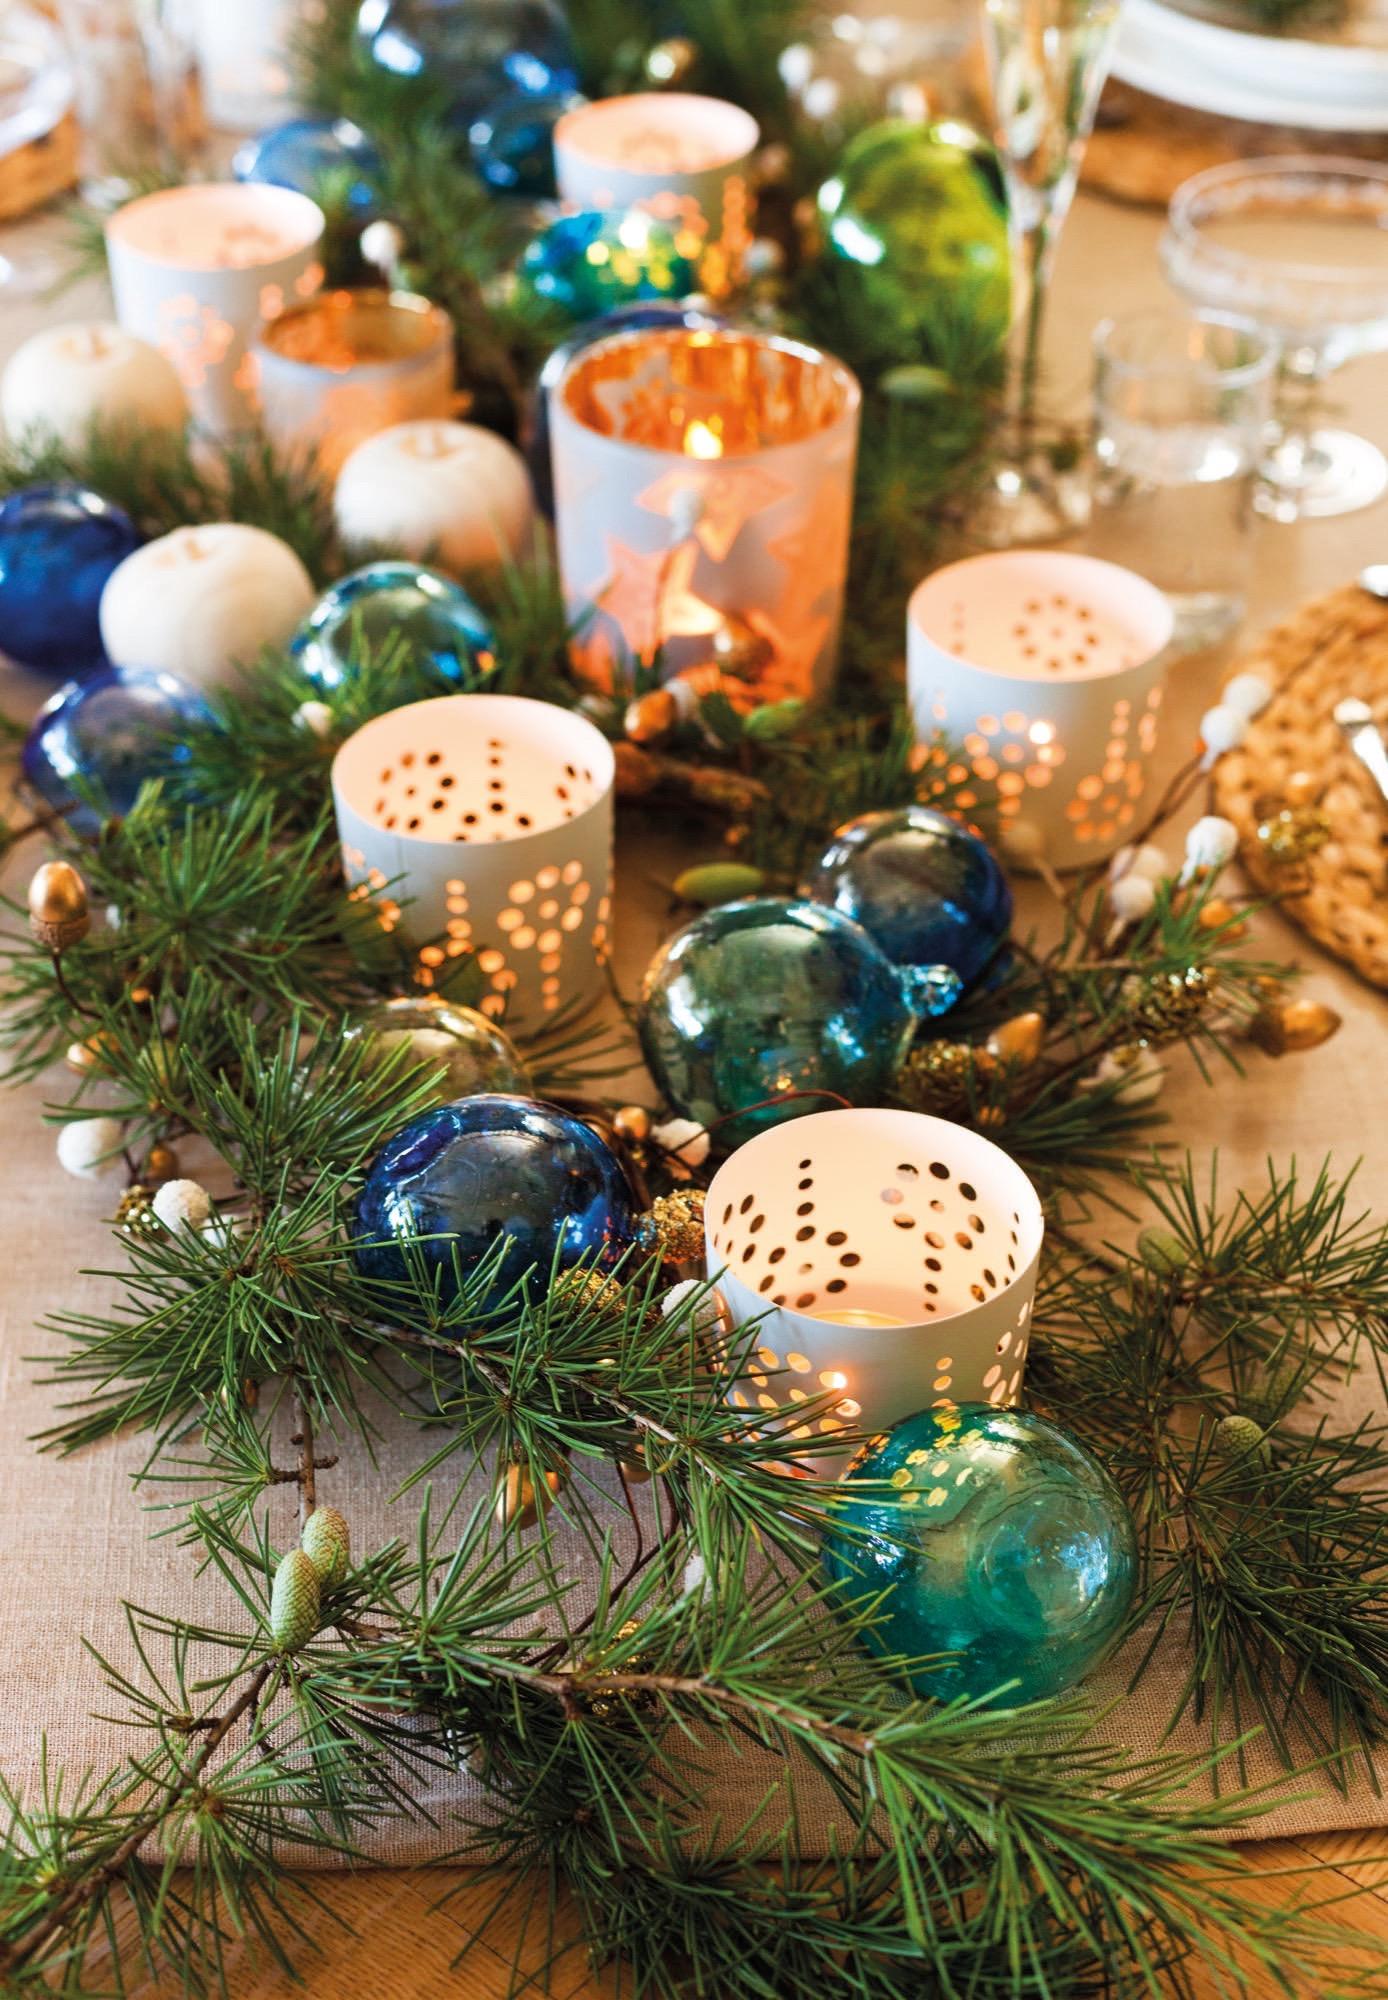 Navidad en casa de lorenzo meazza responsable de - Decoracion navidena ikea ...